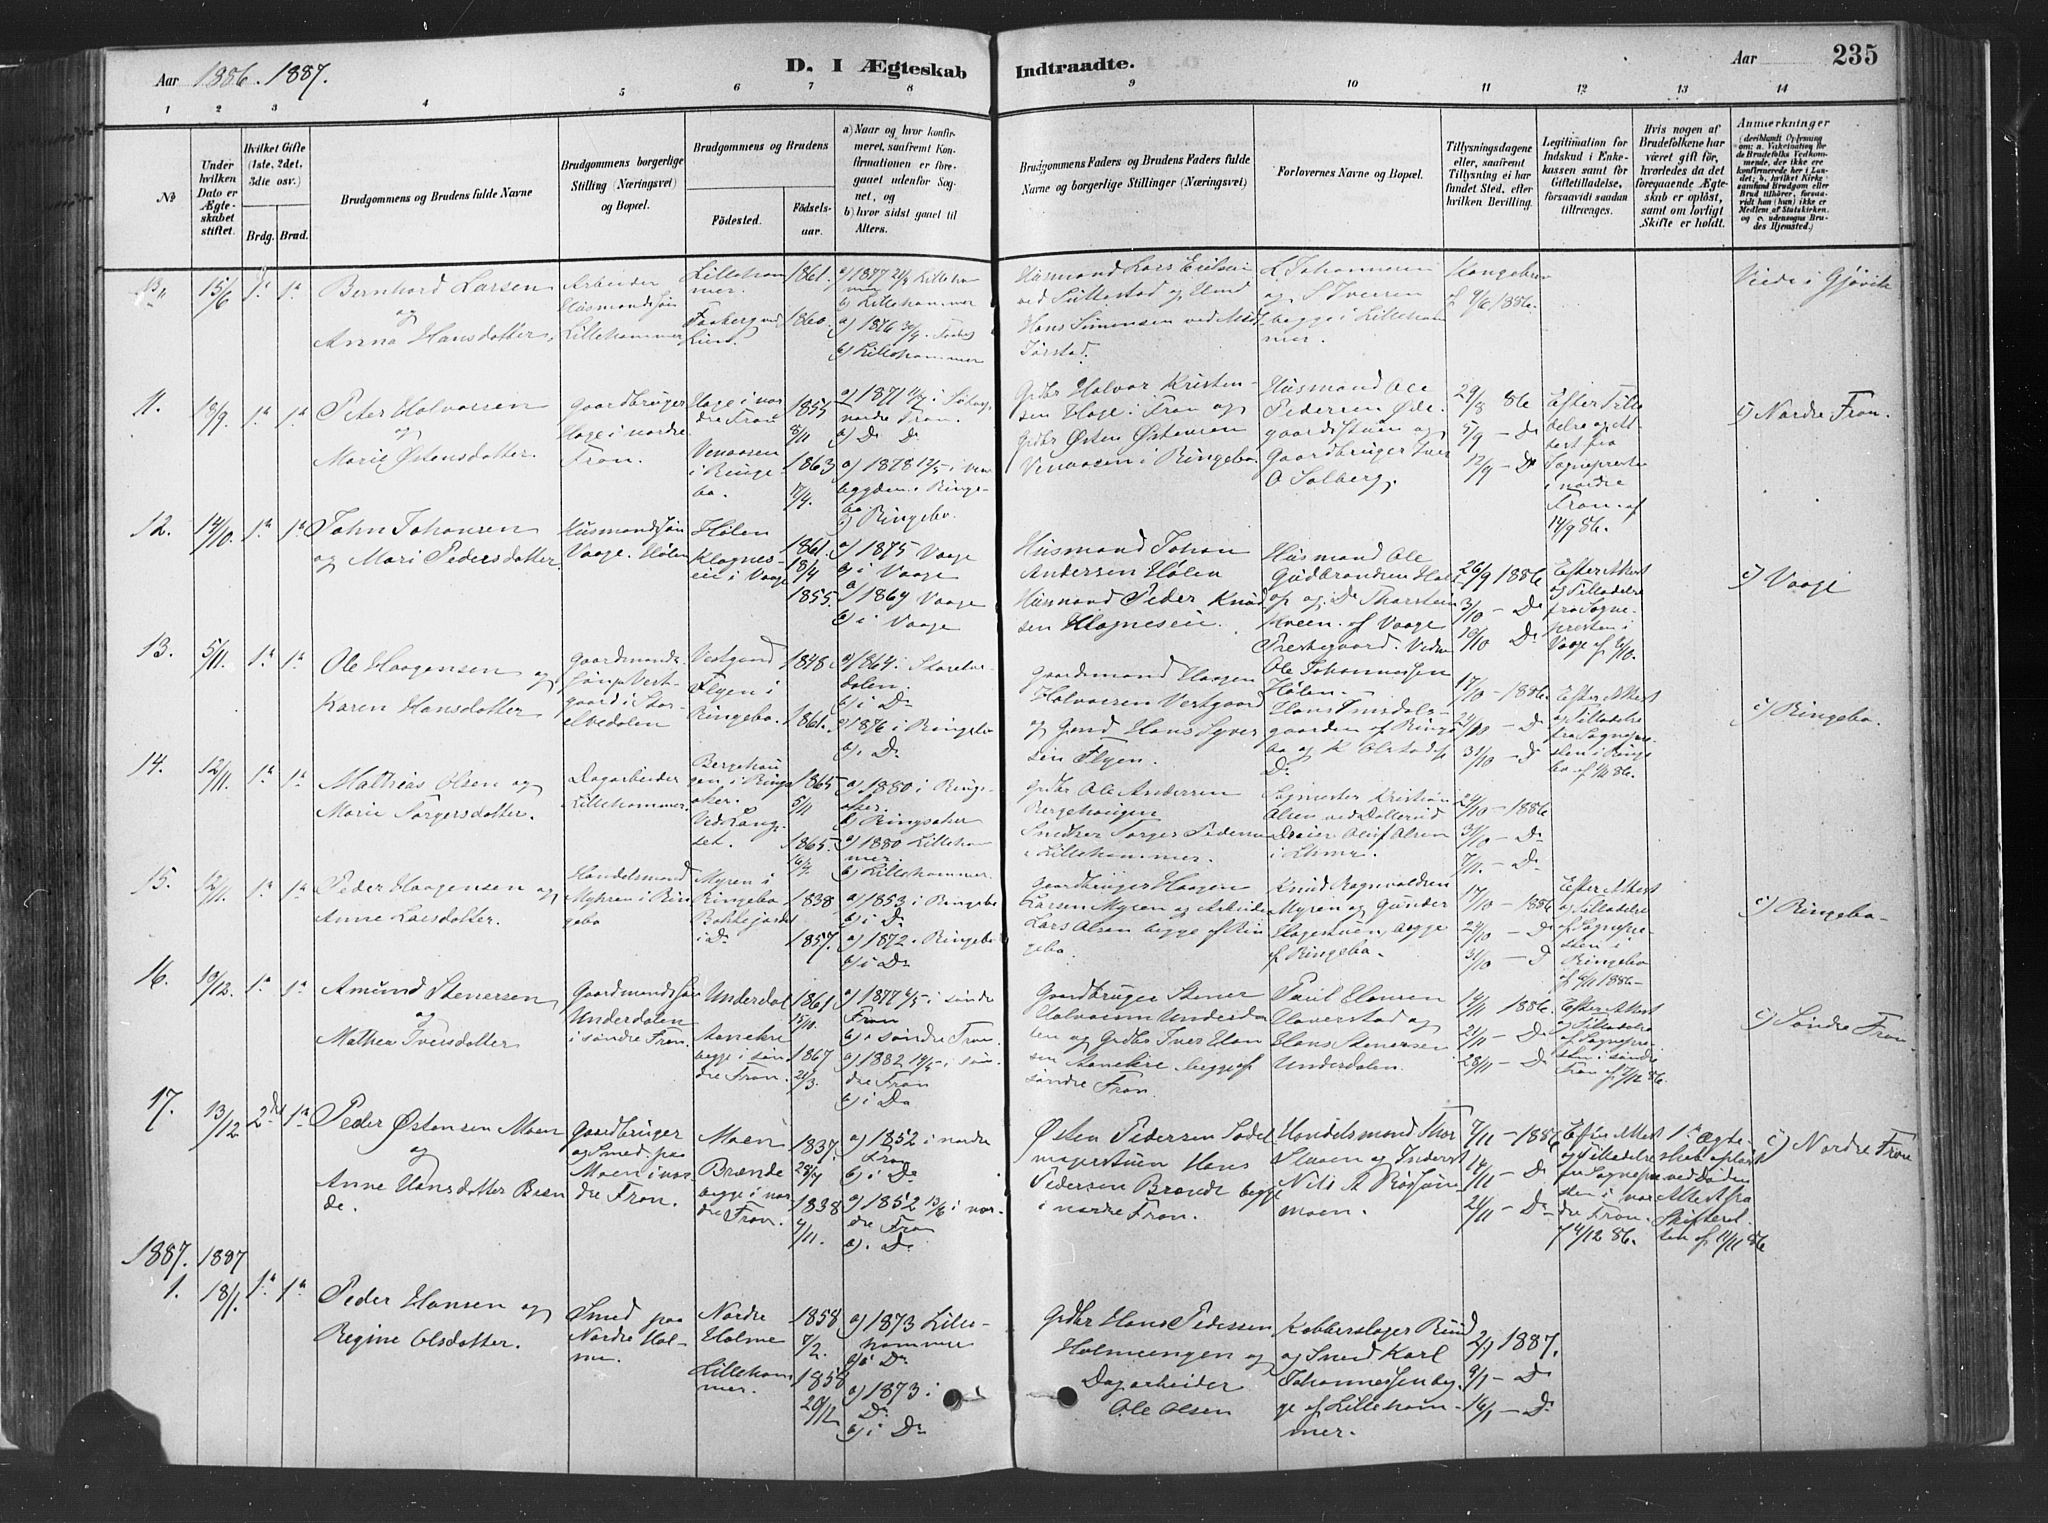 SAH, Fåberg prestekontor, H/Ha/Haa/L0010: Parish register (official) no. 10, 1879-1900, p. 235